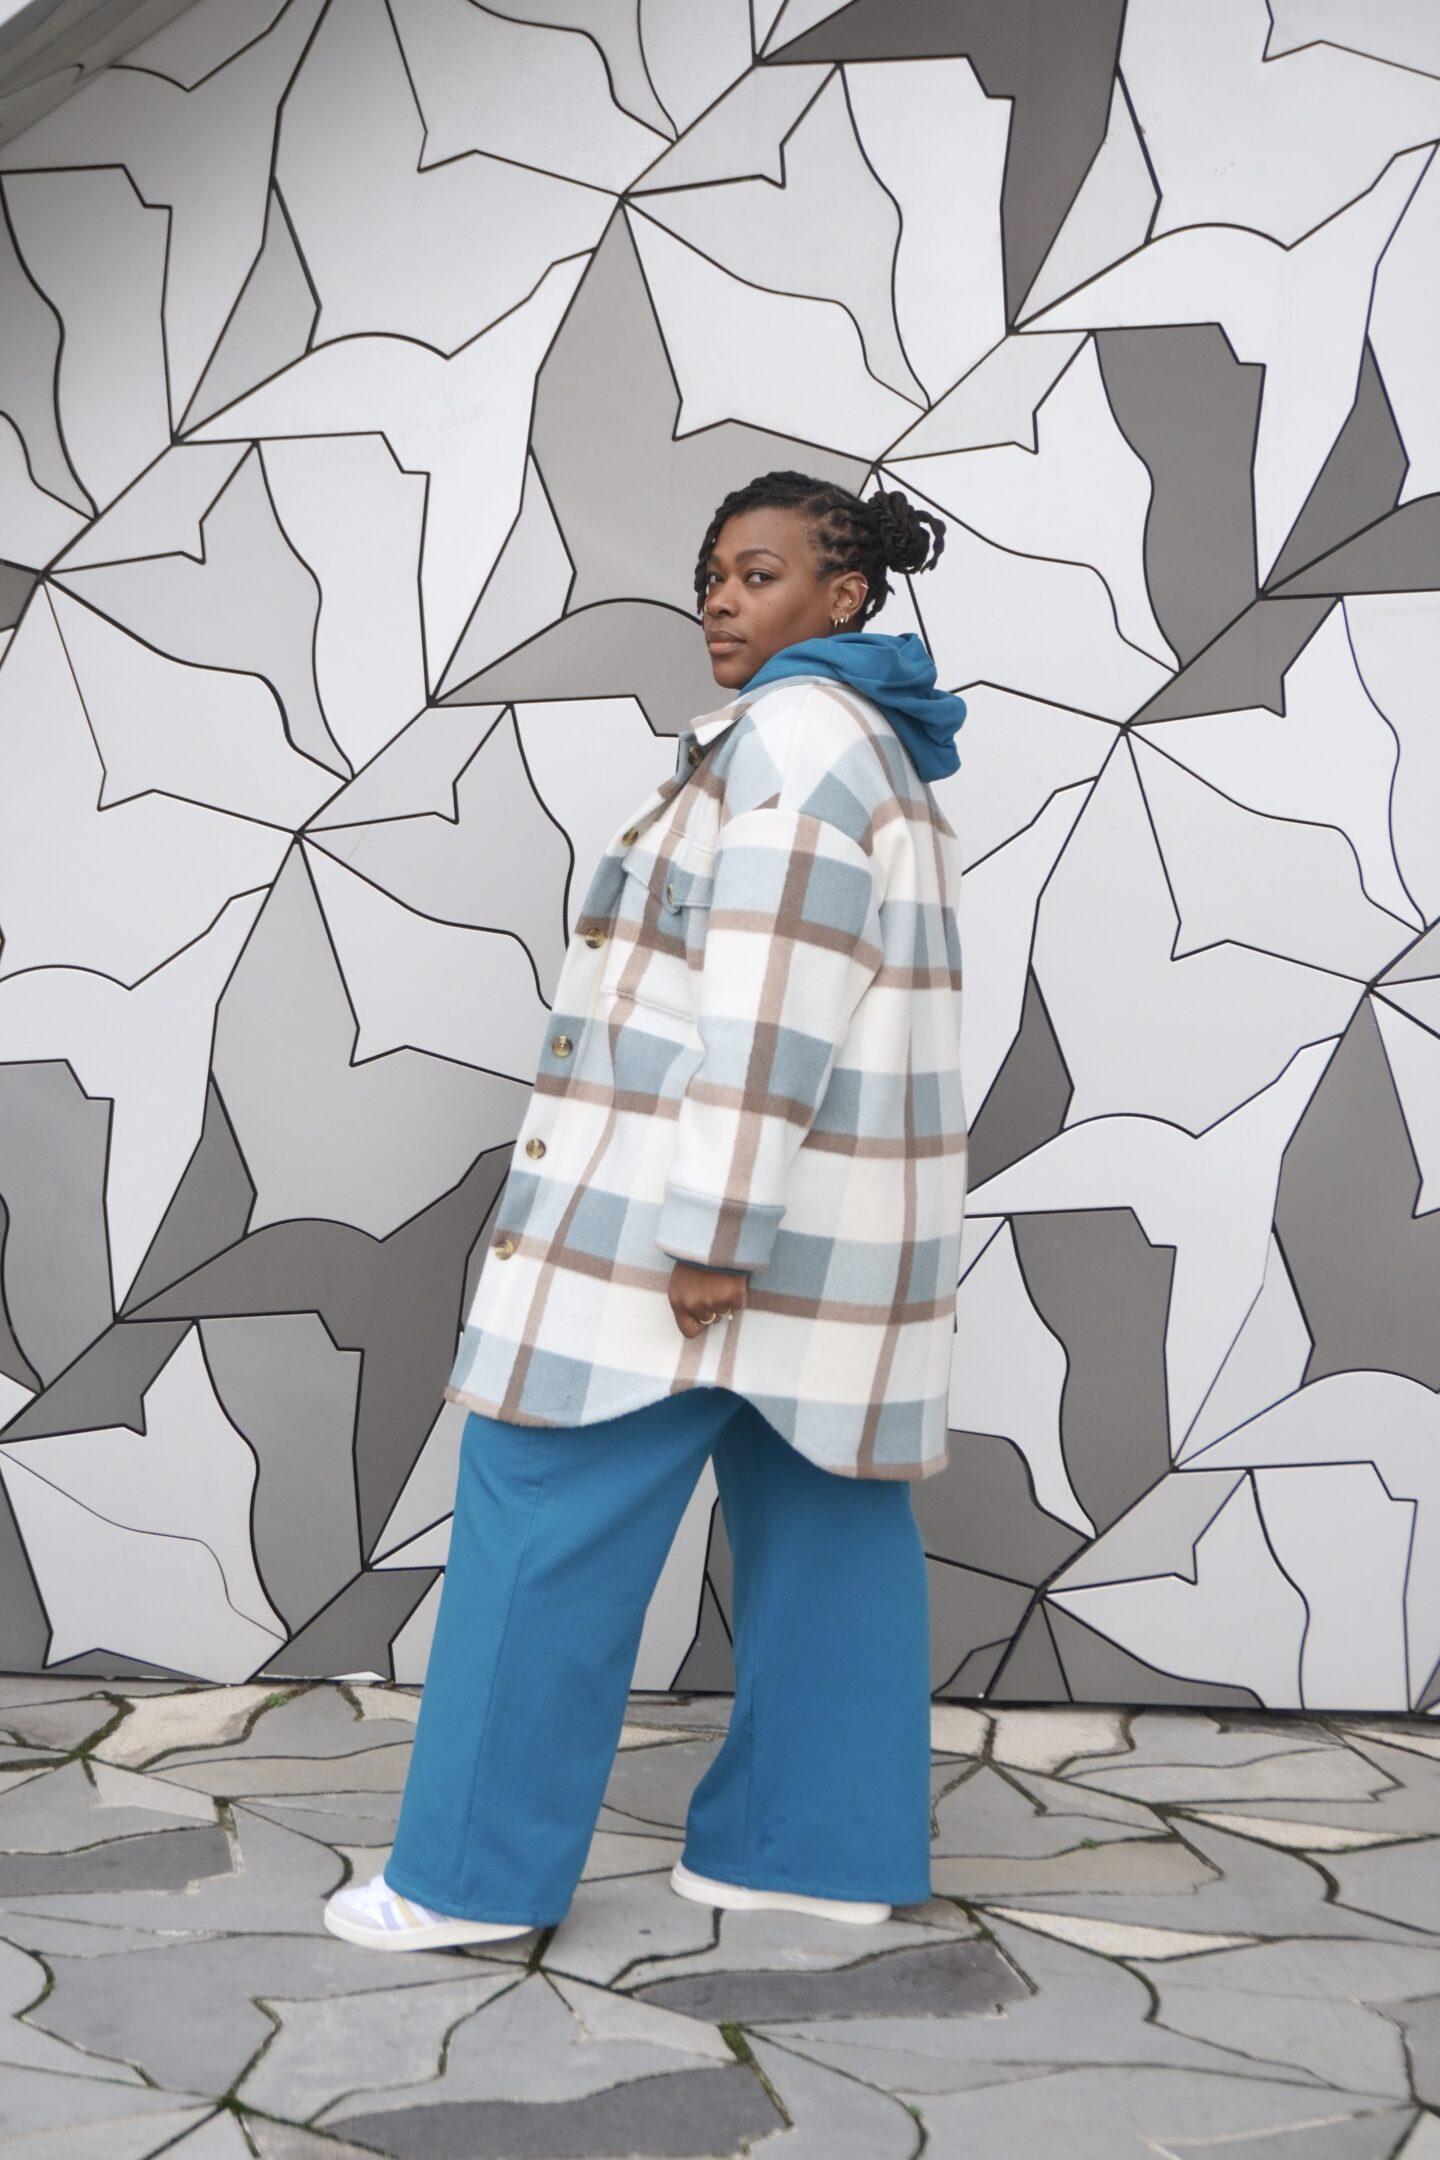 Couture manteau